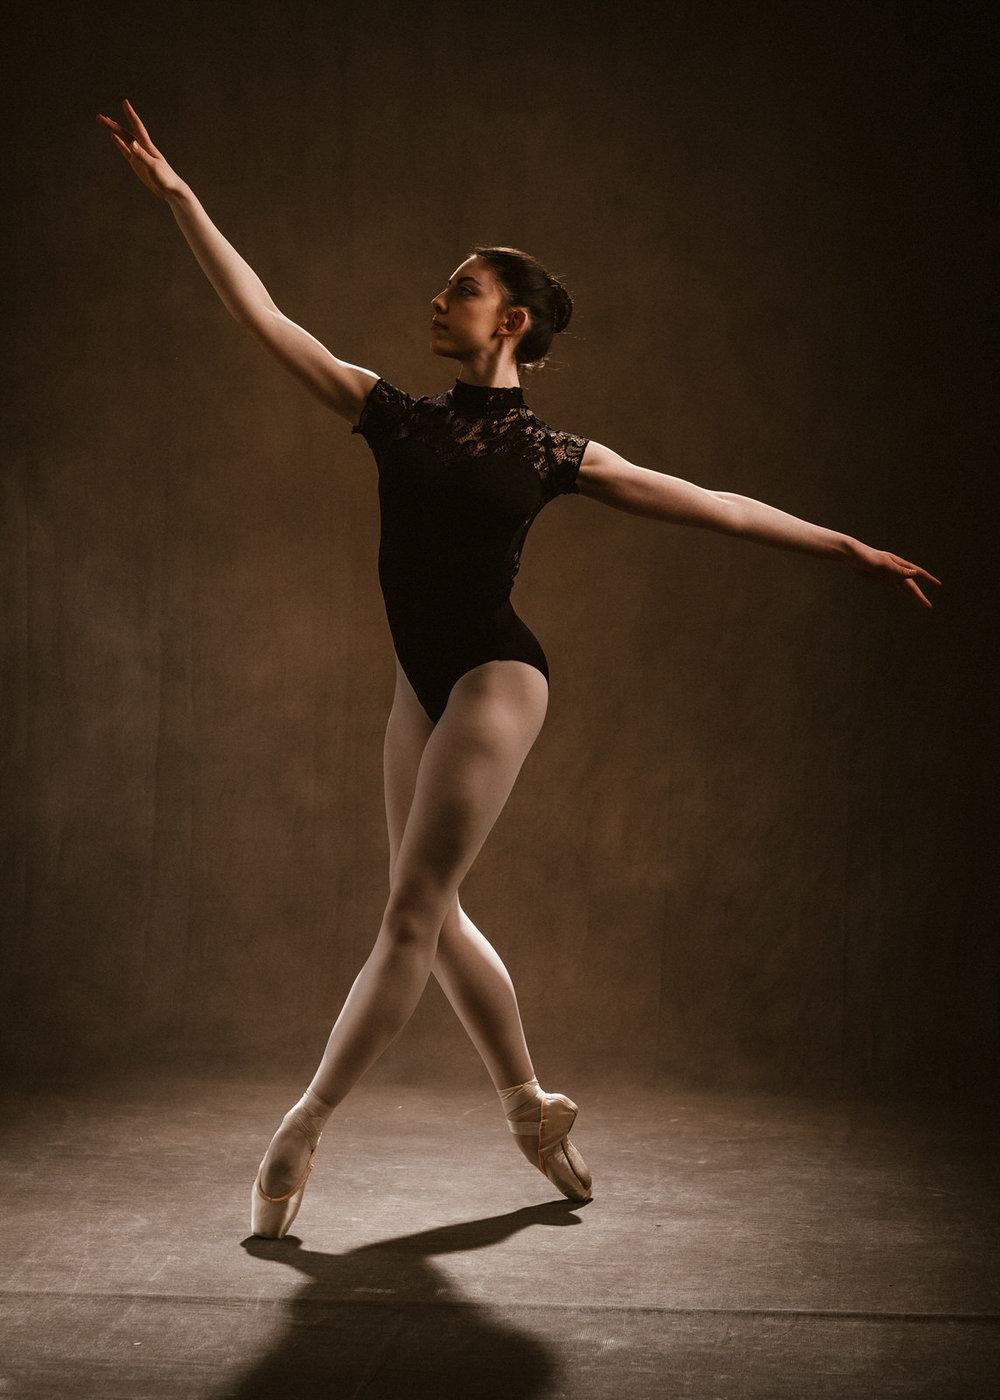 Sarah_Nolan_Ballet_001.jpg